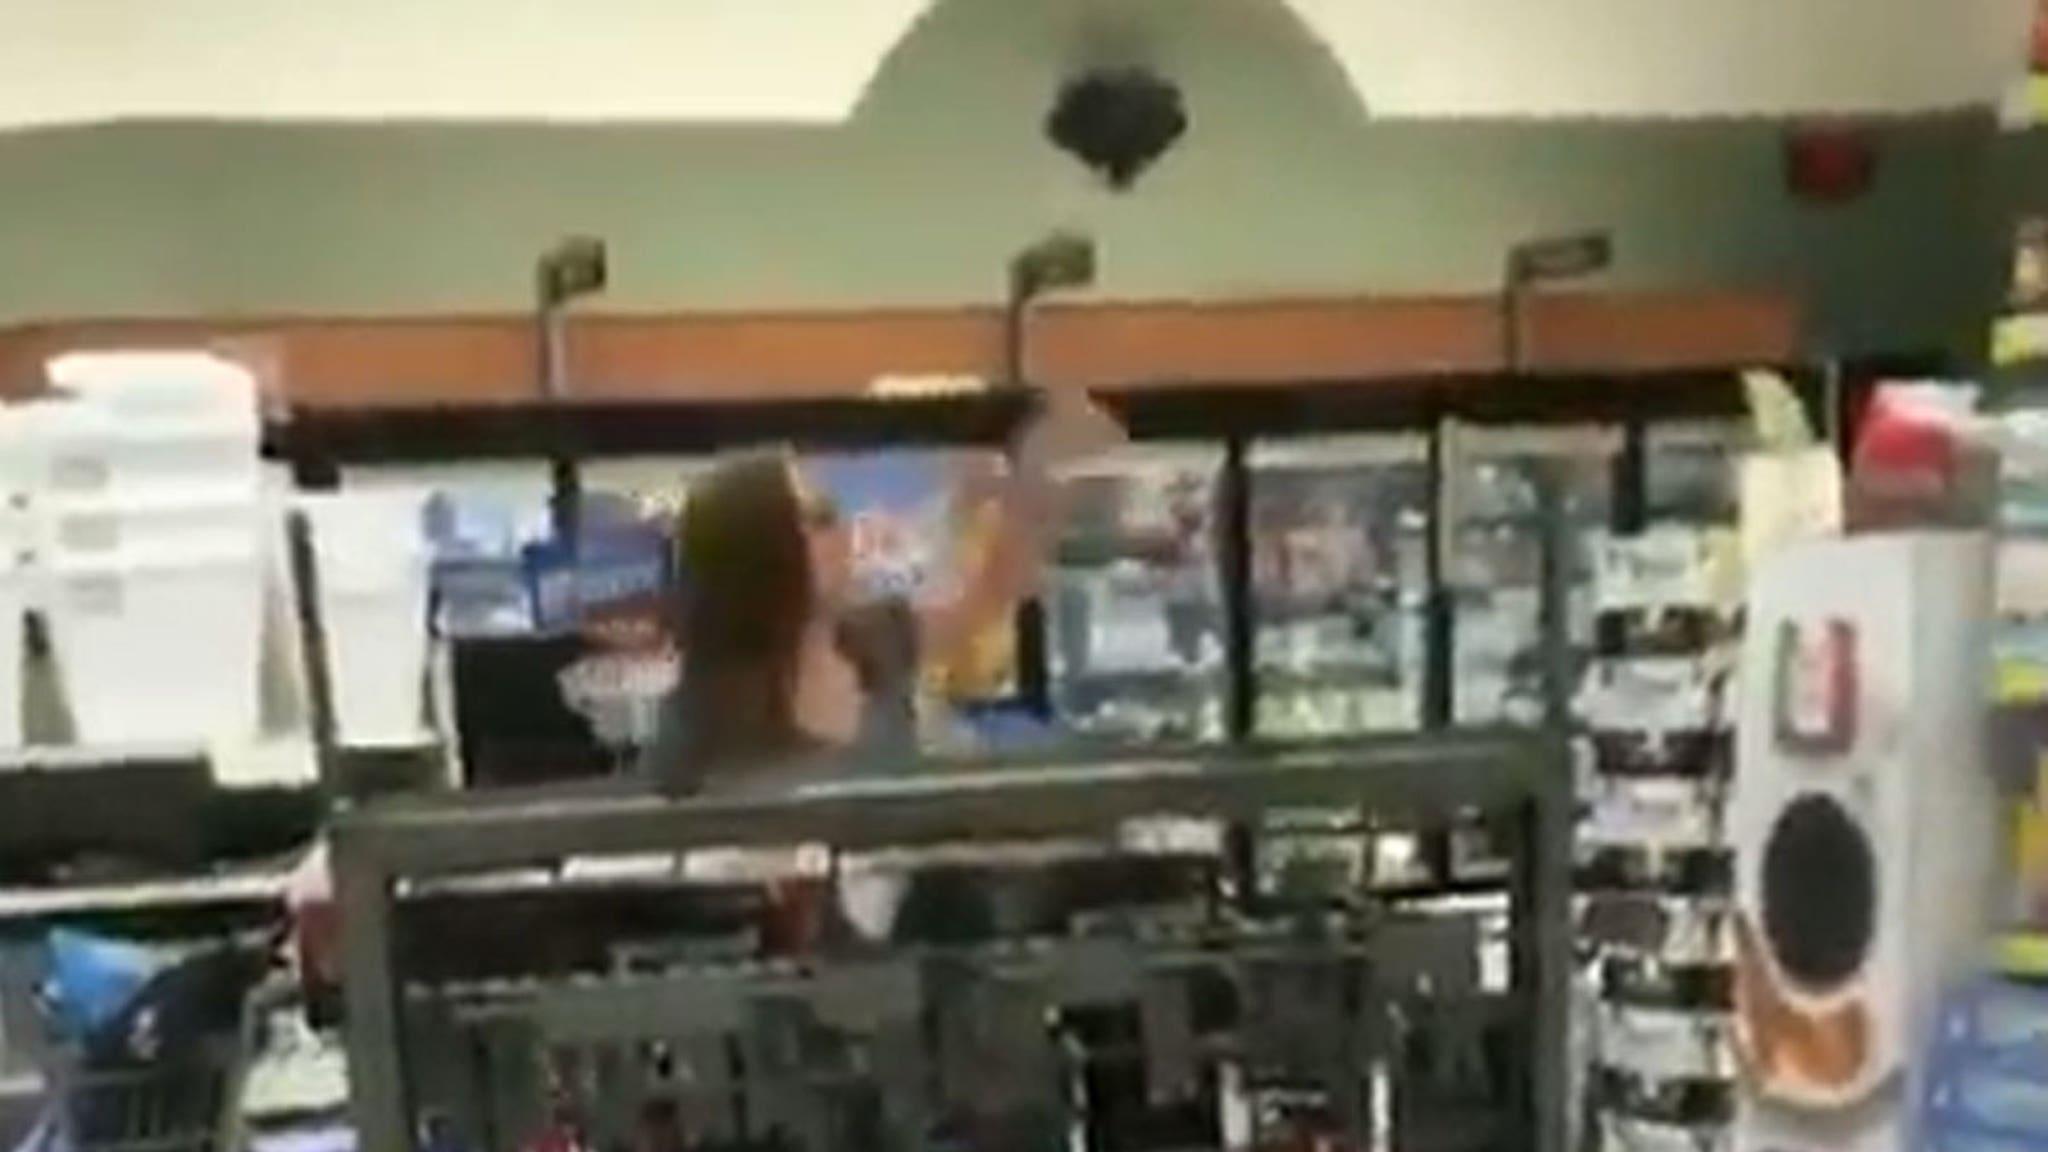 Long Island Anti-Masker Hurls Insults, Threats Against Supermarket Employee